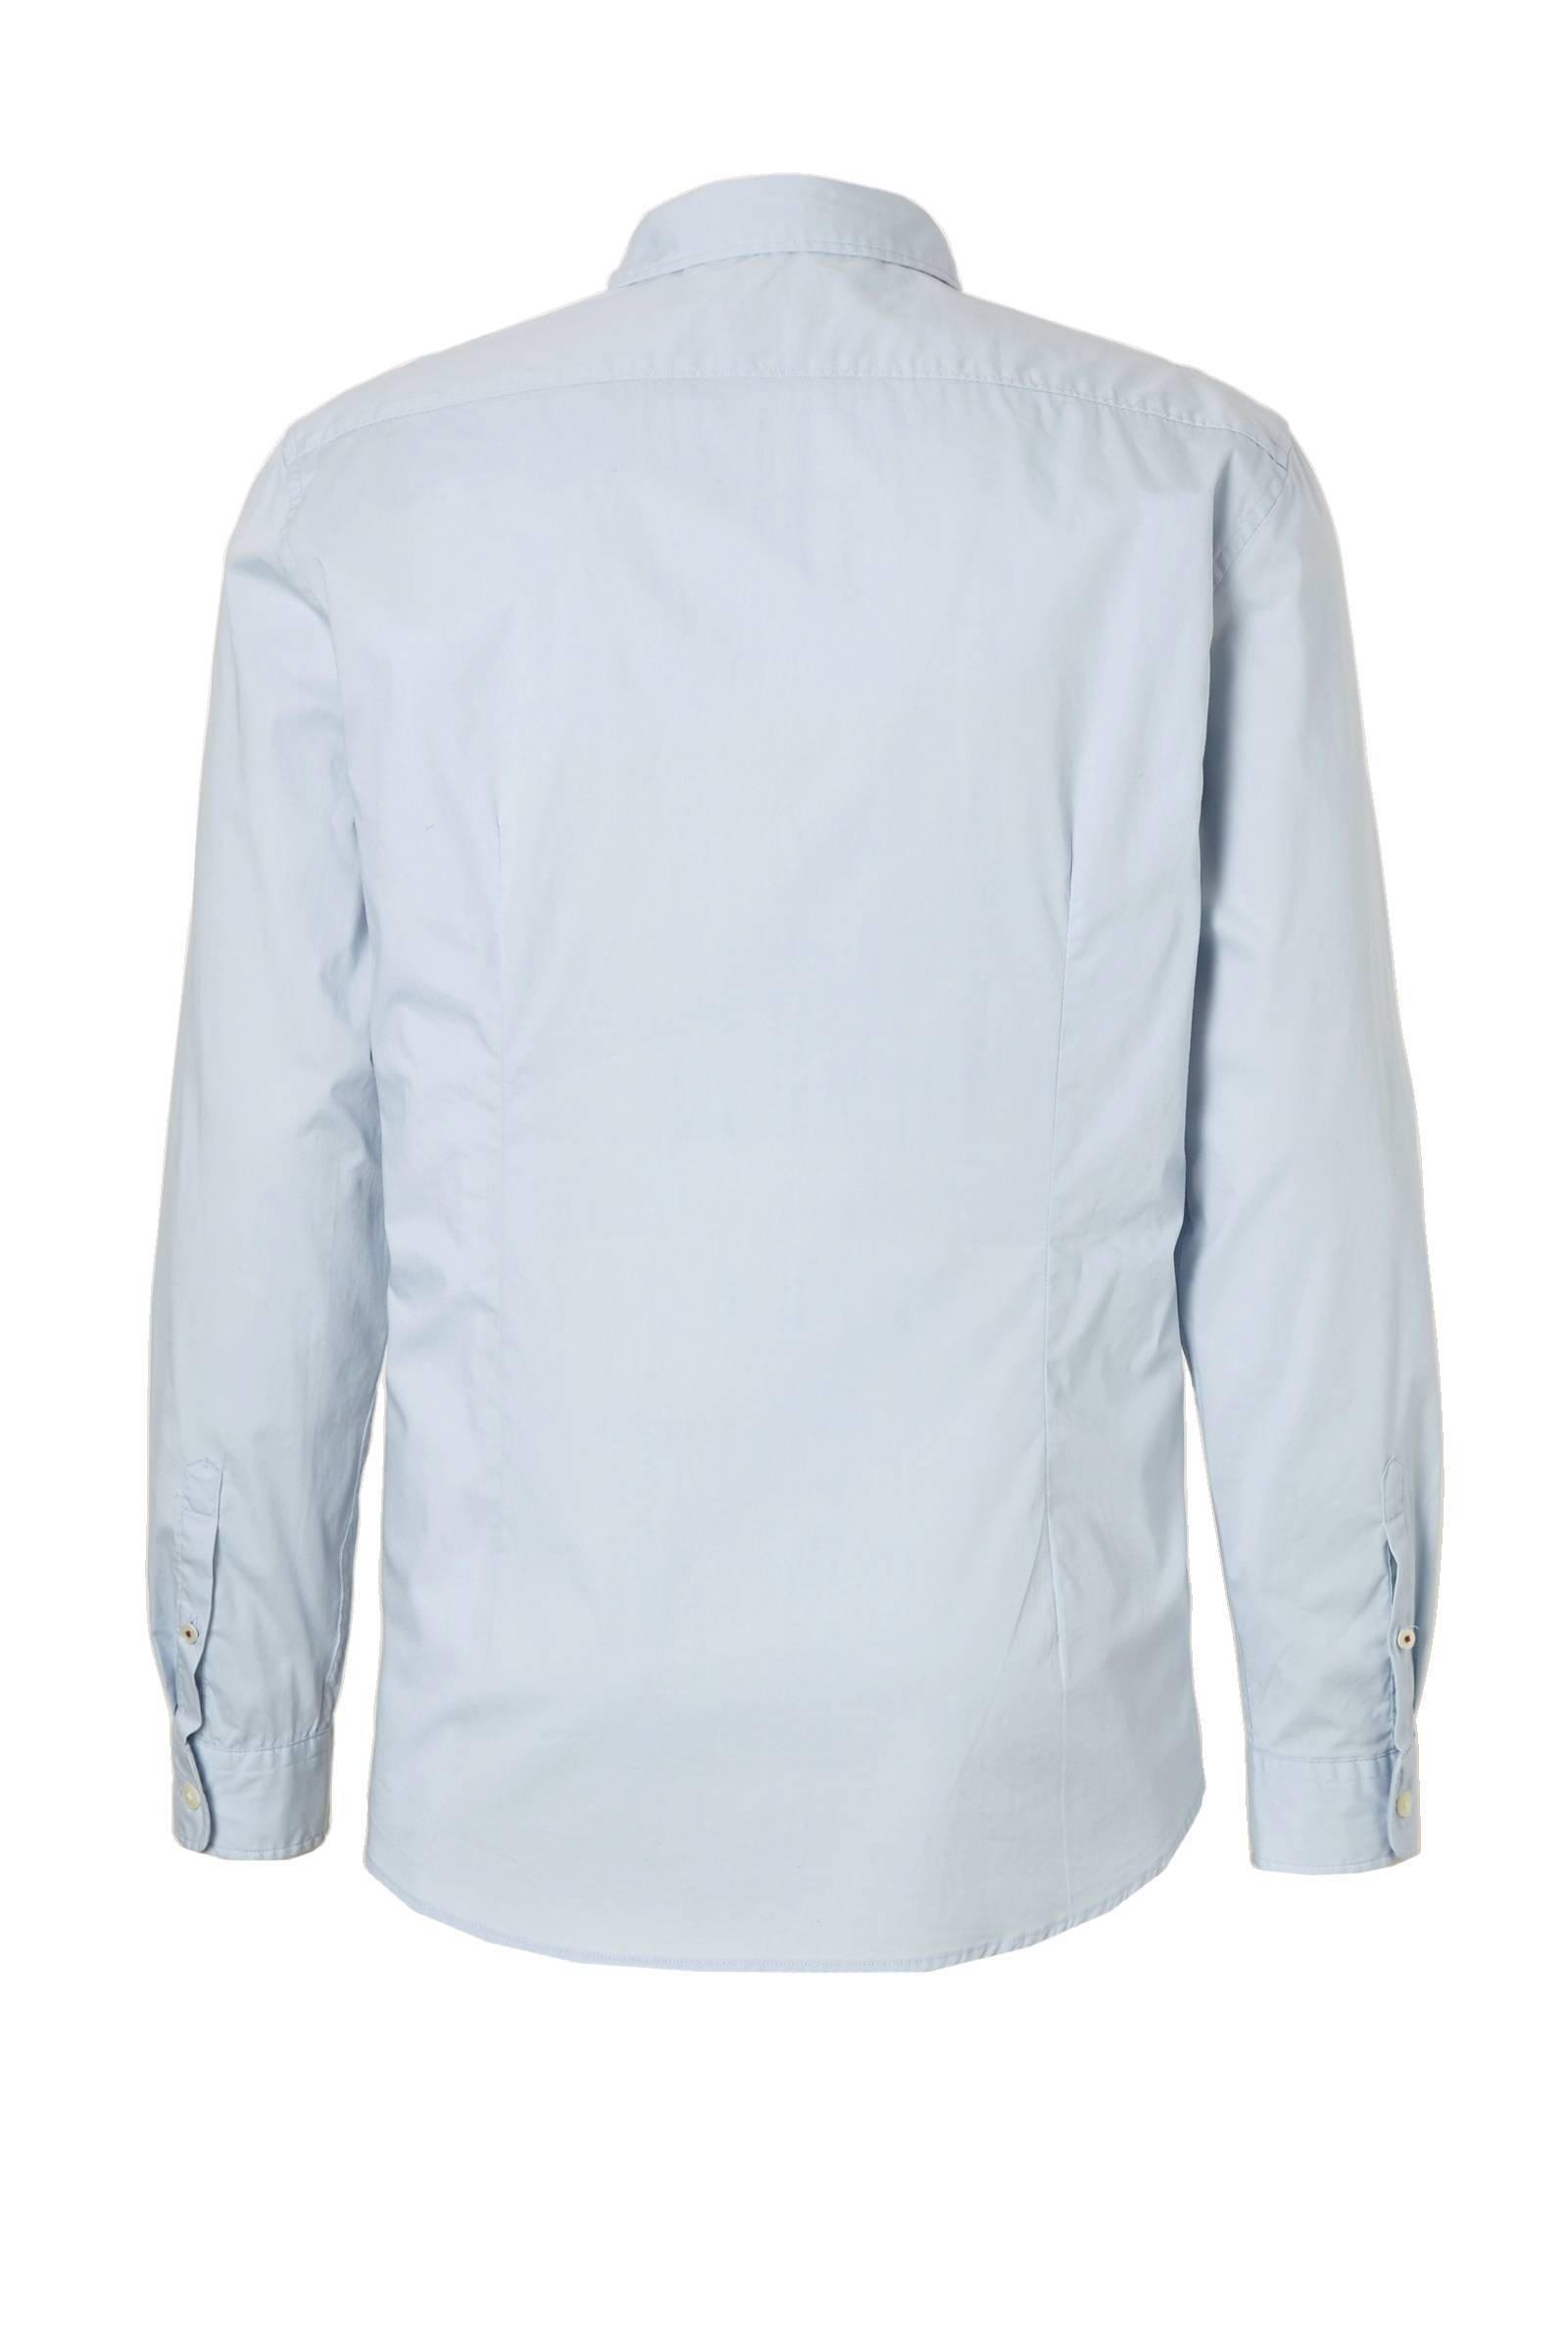 fit ESPRIT overhemd Casual slim Men qfrtf